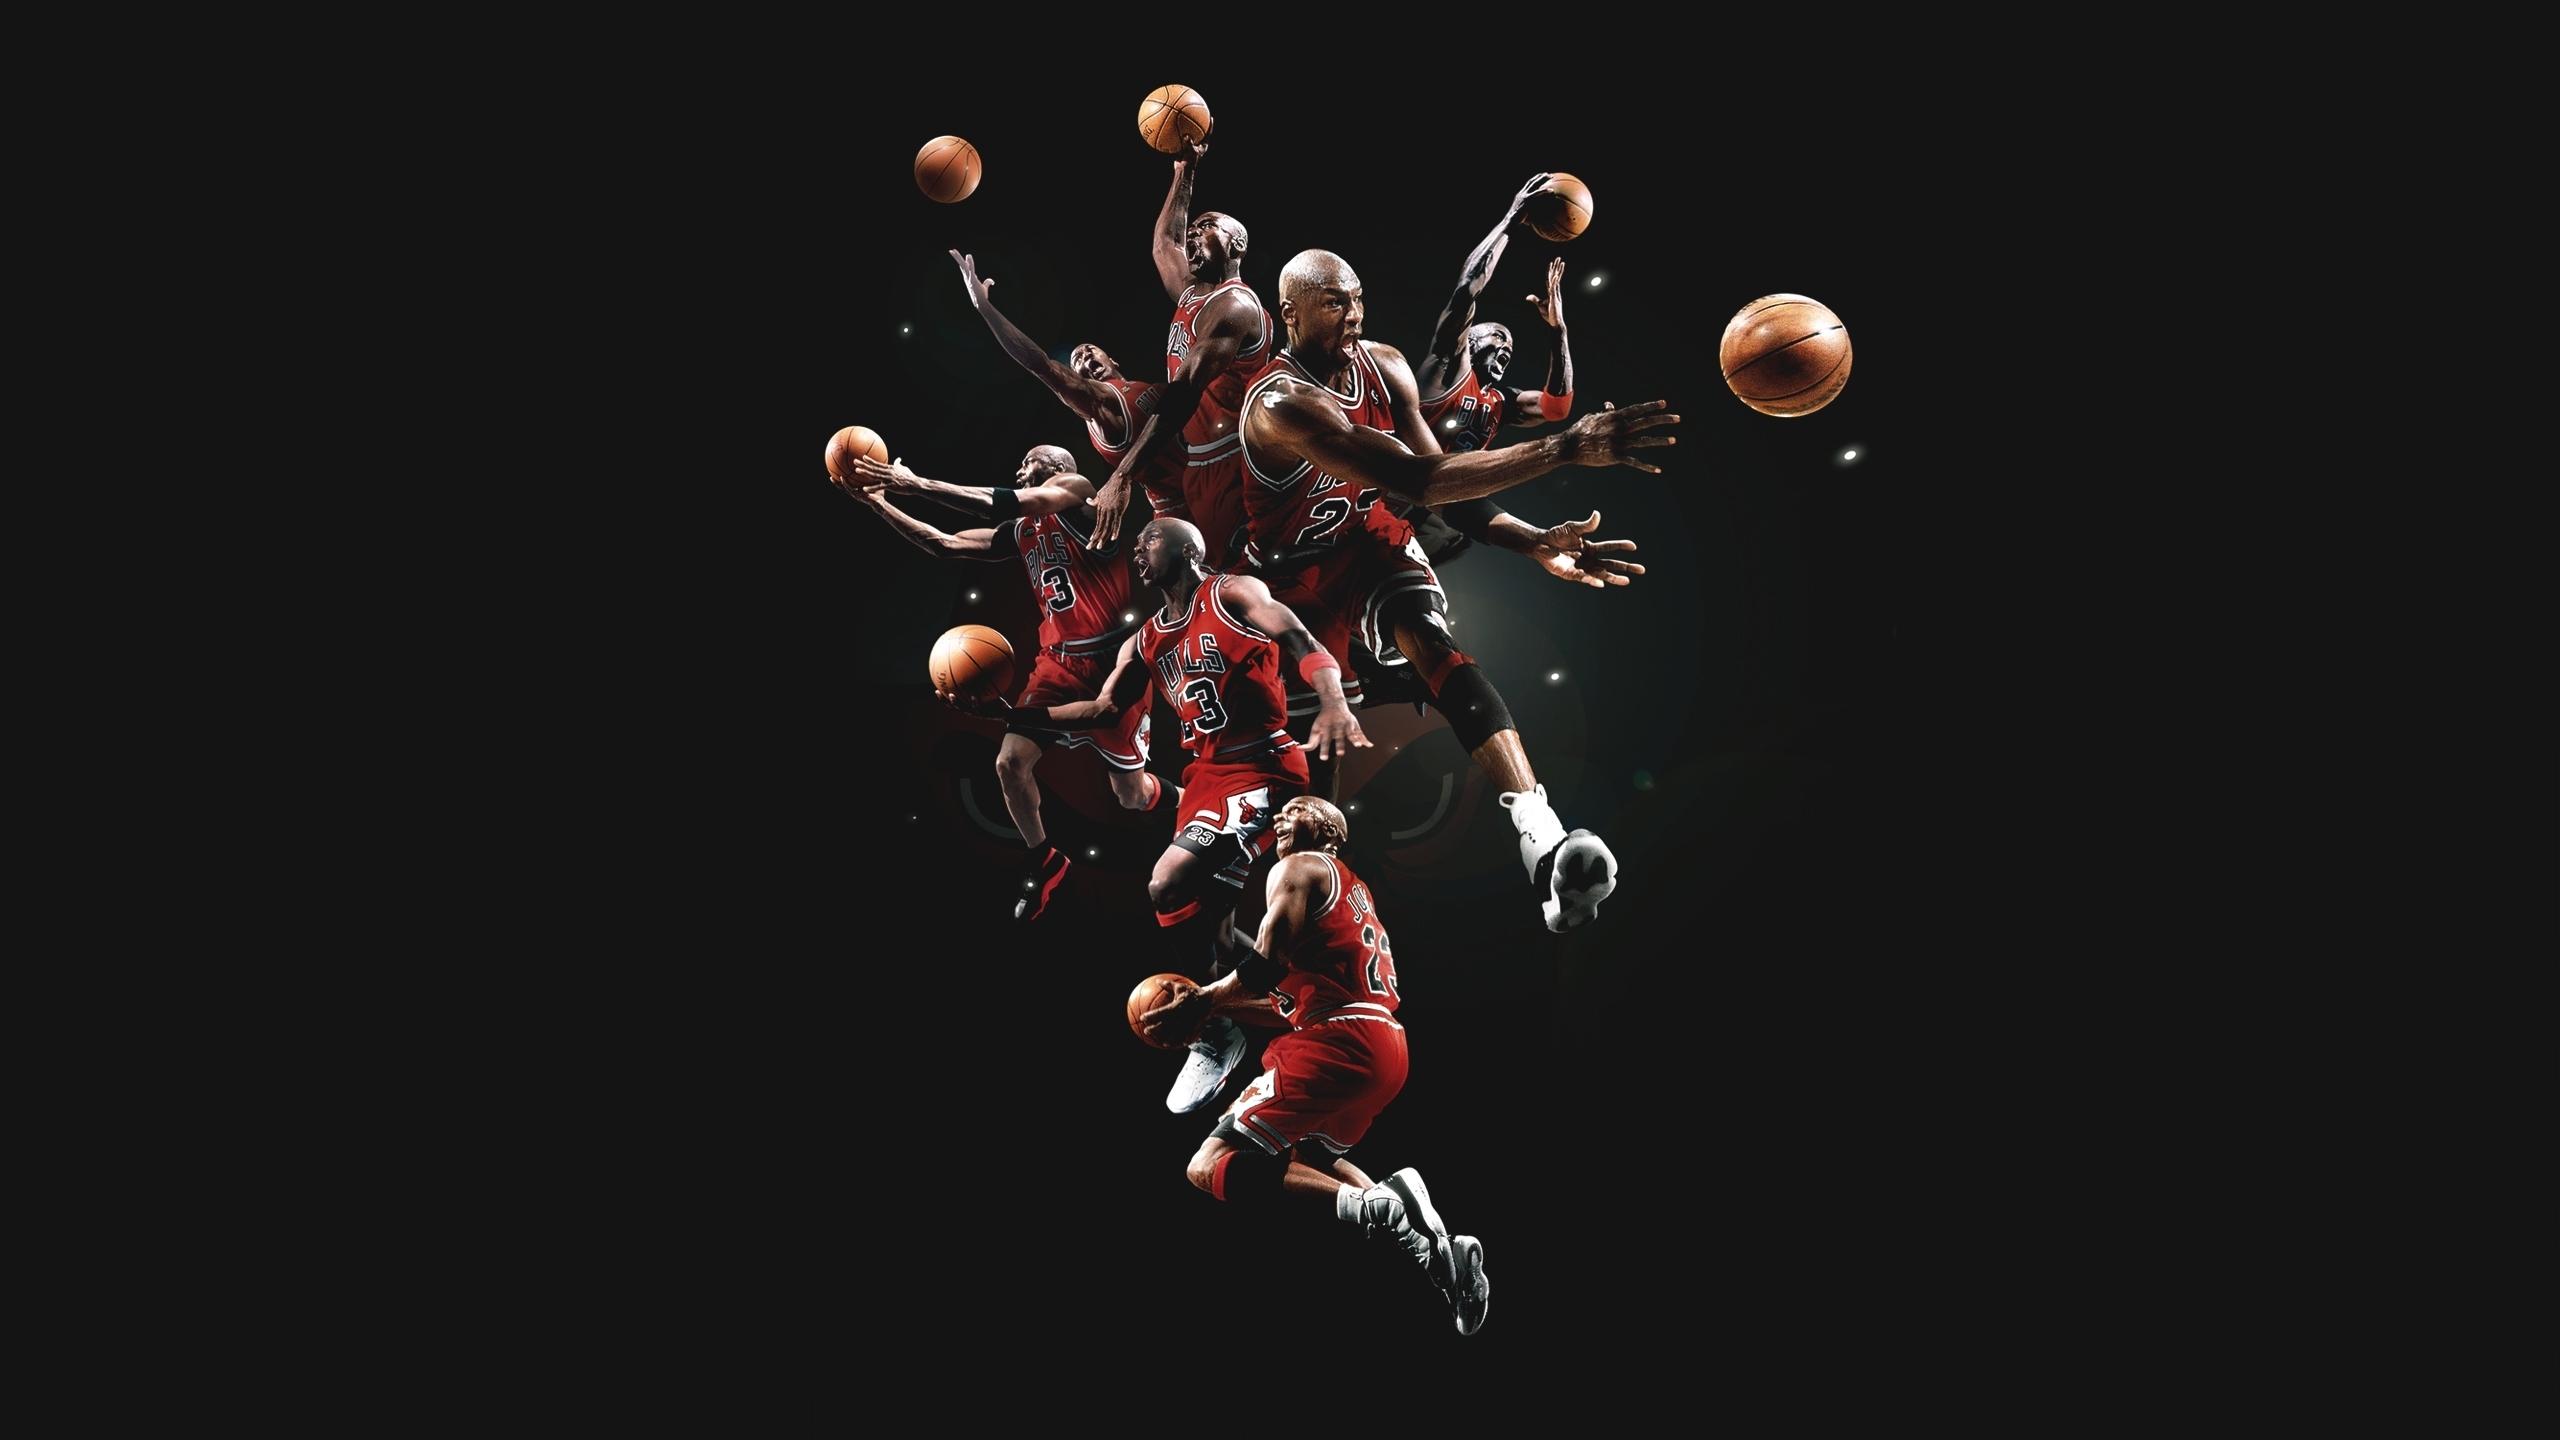 баскетбол улица солнце  № 2896545  скачать